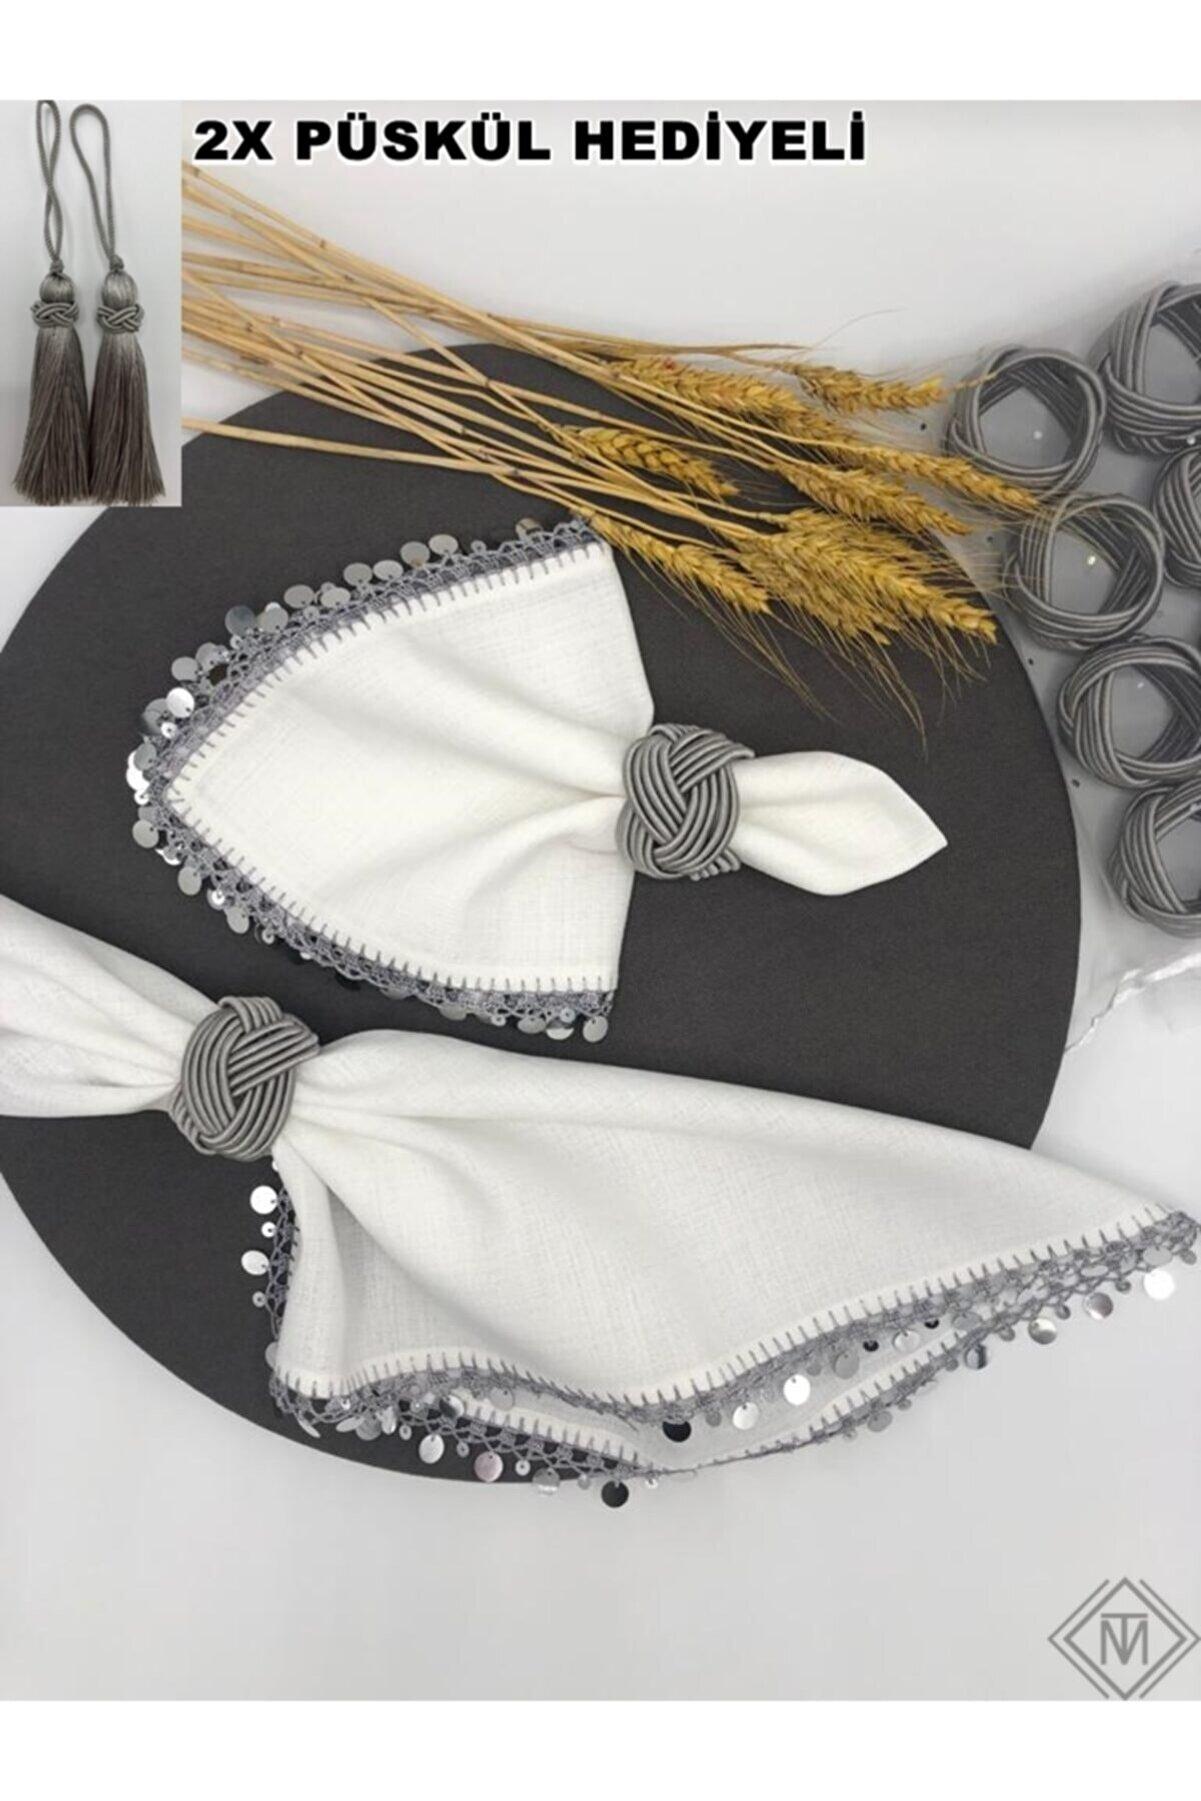 miraç tekstil Peçete Yüzük Halkası Burgulu 8'li Set Füme